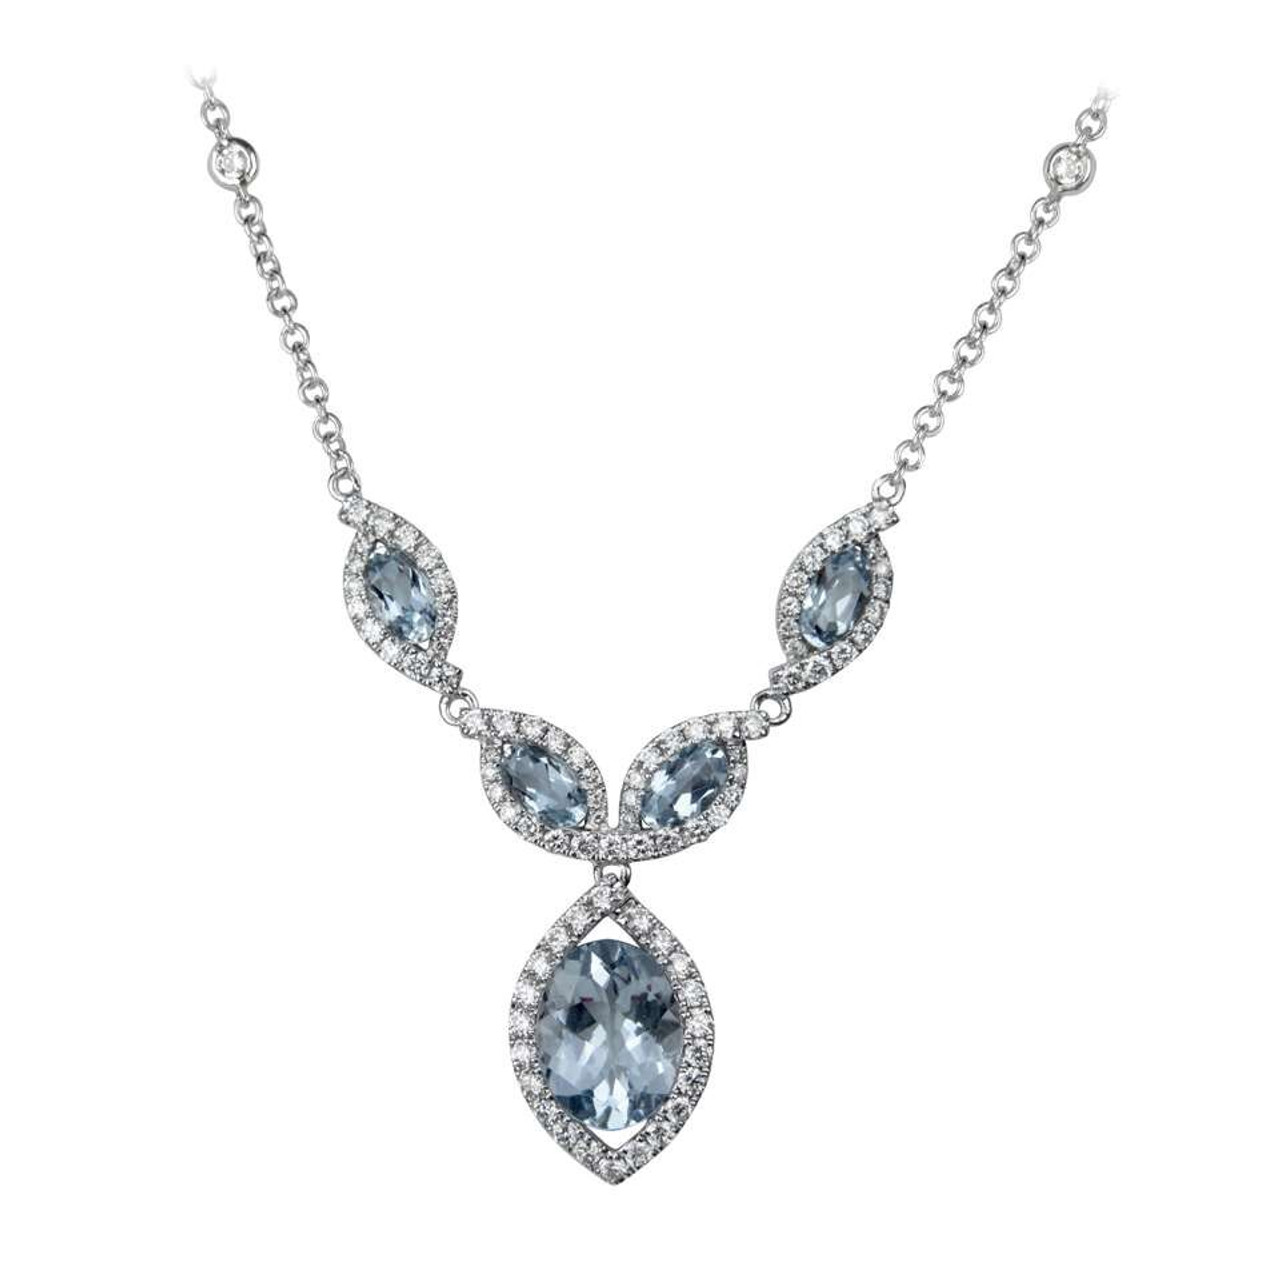 18ct White Gold Aquamarine & Diamond Necklace